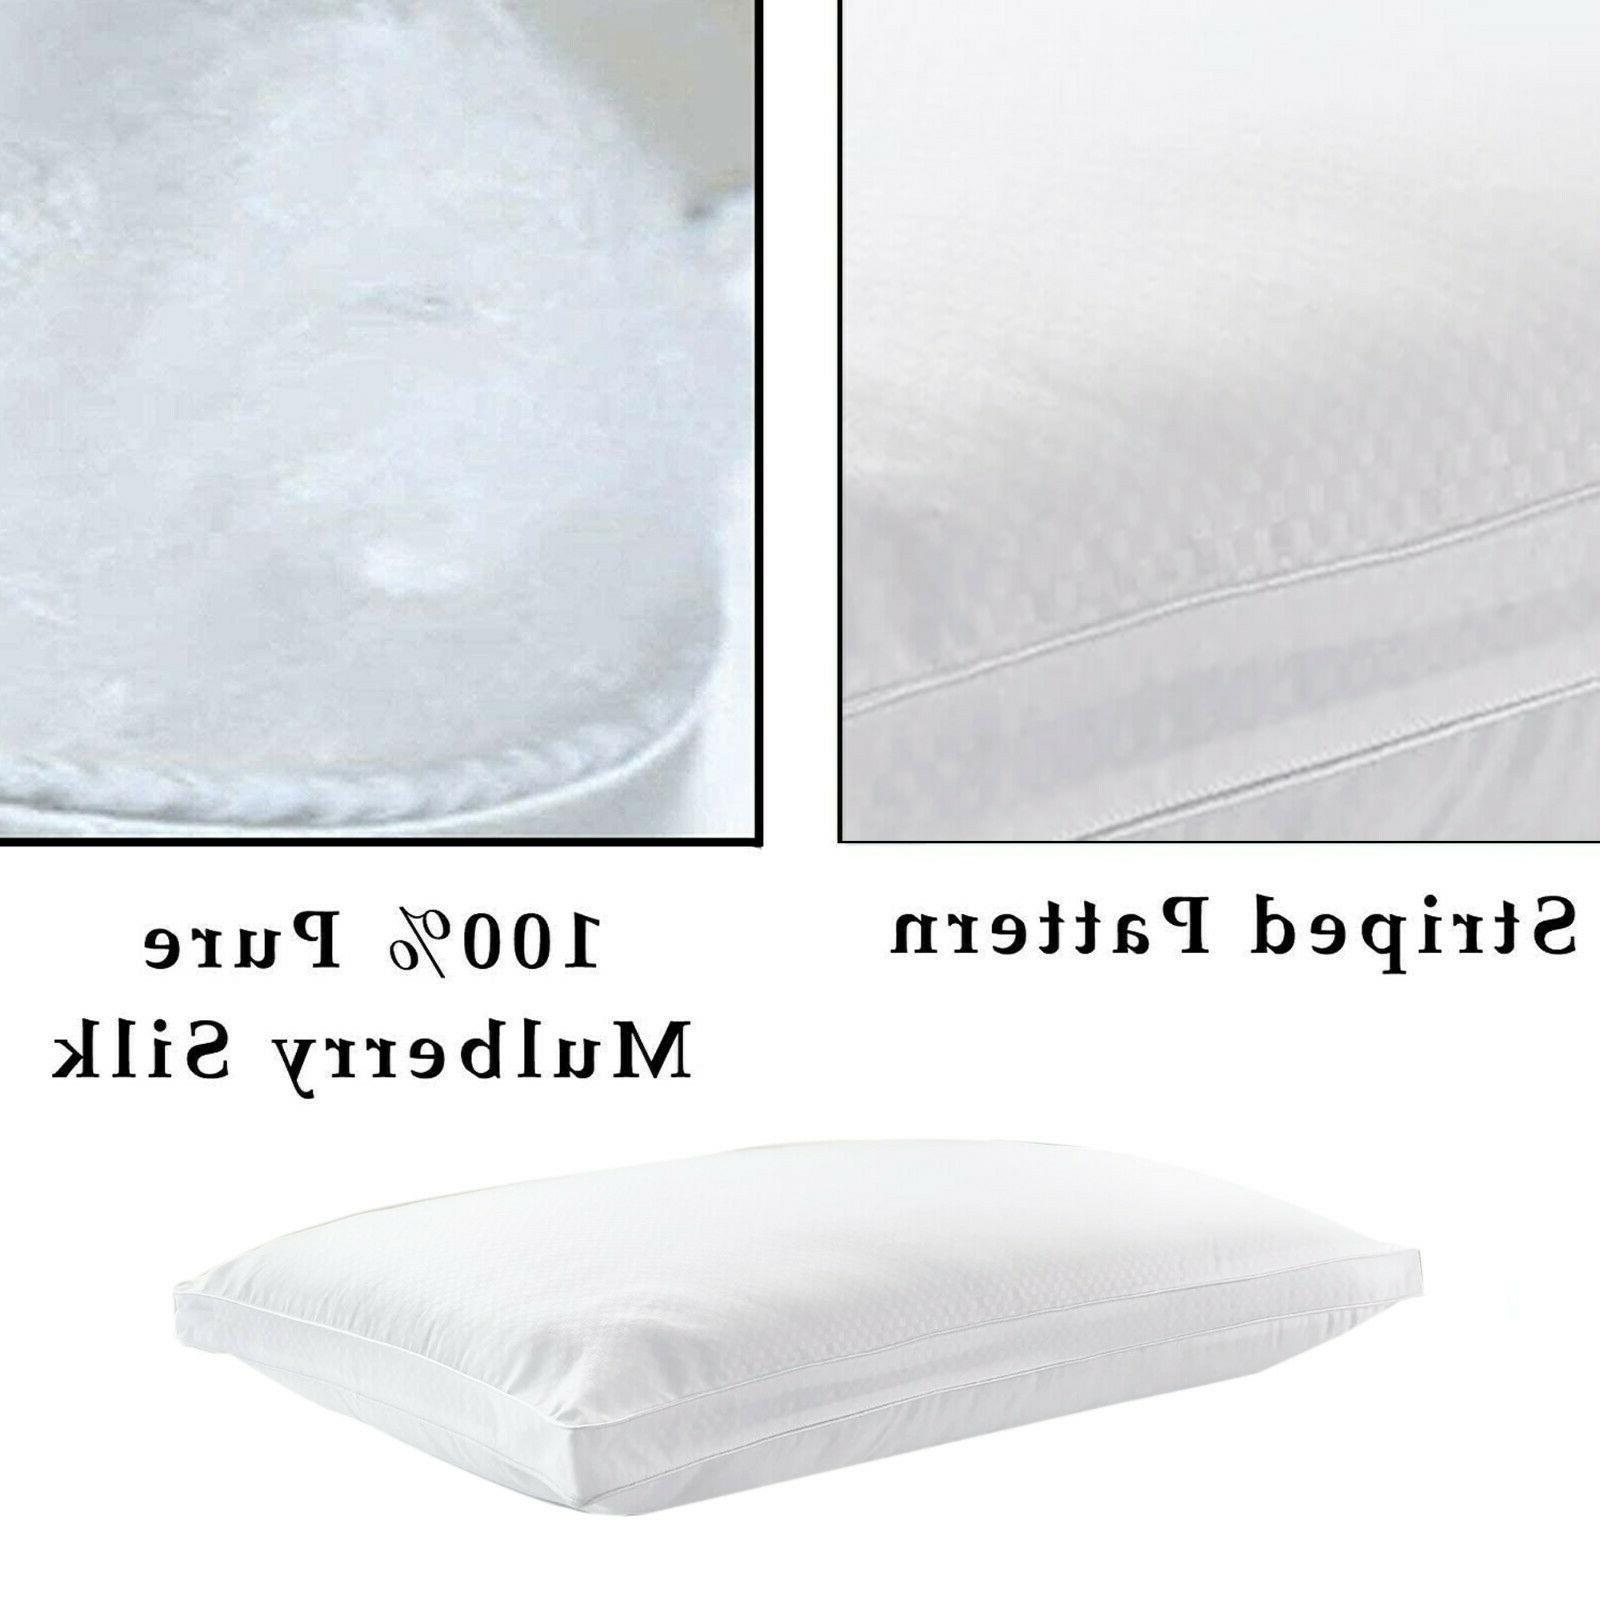 Kensingtons® 100% Pure Silk Pillows Feel Like Down